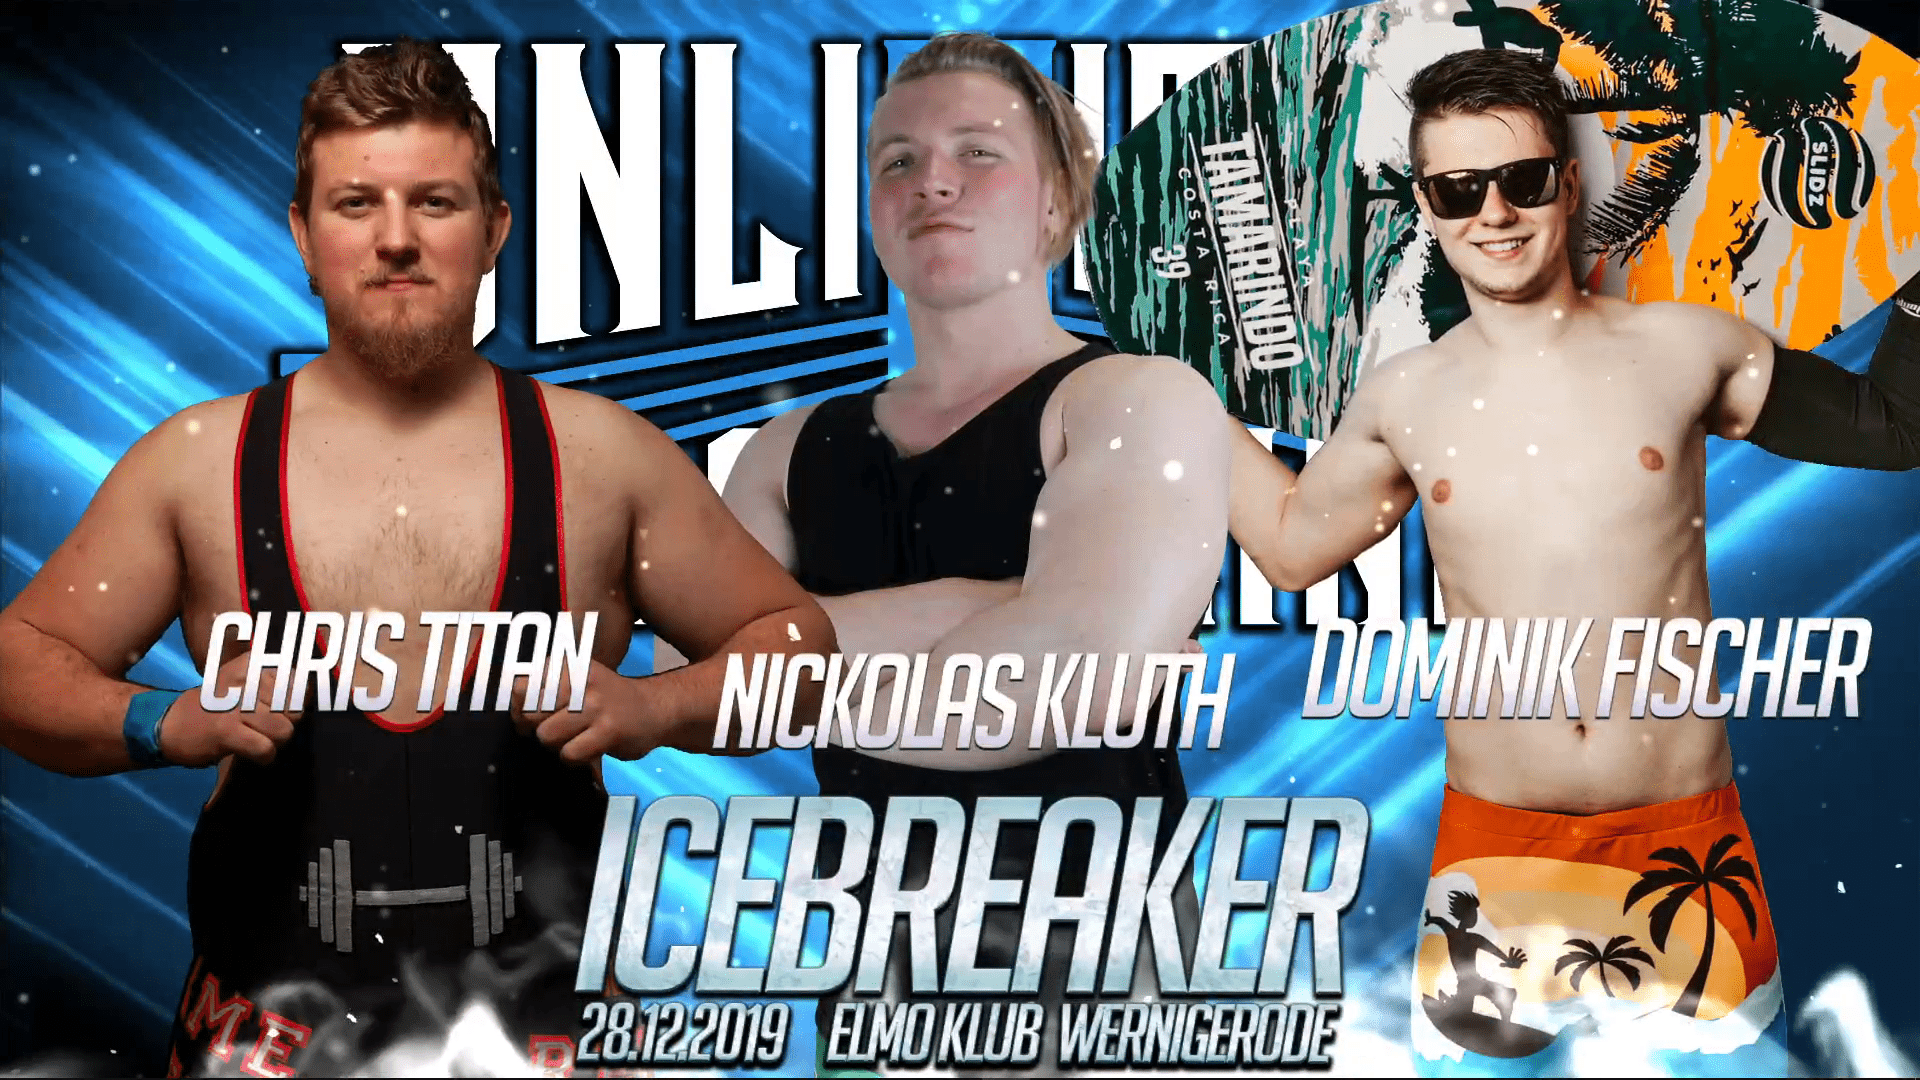 Triple Threat MatchChris Titan vs. Nickolas Kluth vs. Dominik Fischer